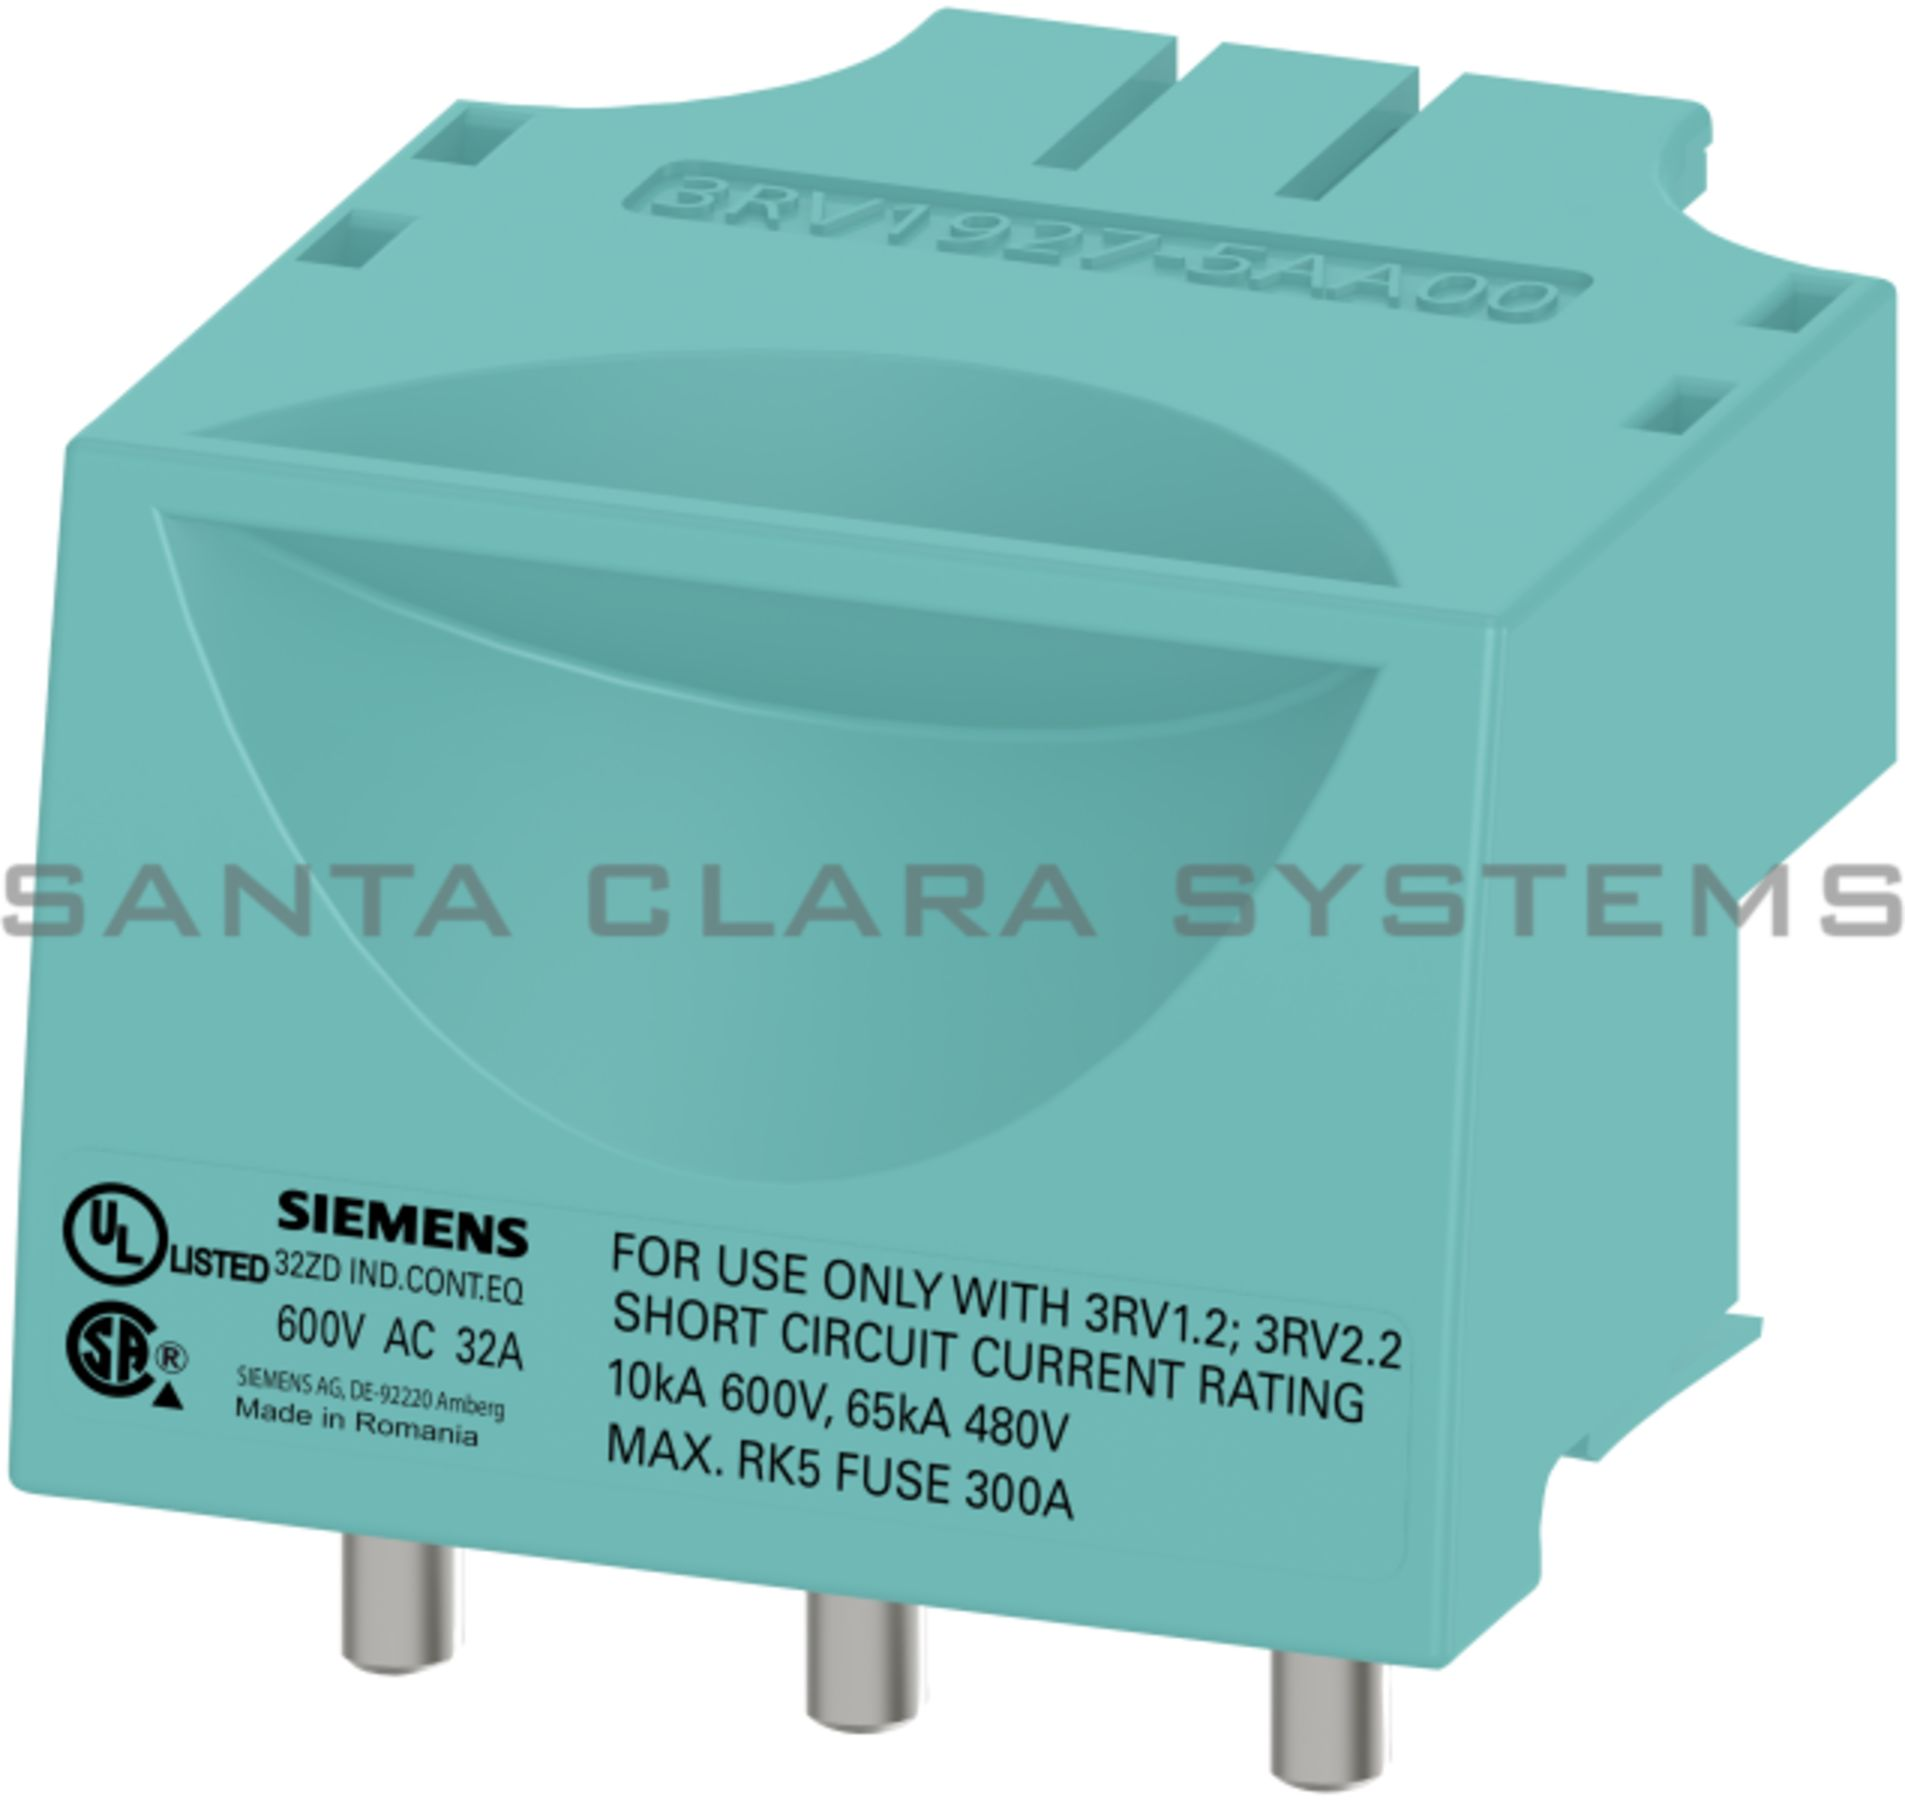 3RV1927-5AA00 Connection Plug In-Stock. Ships Today - Santa Clara ...